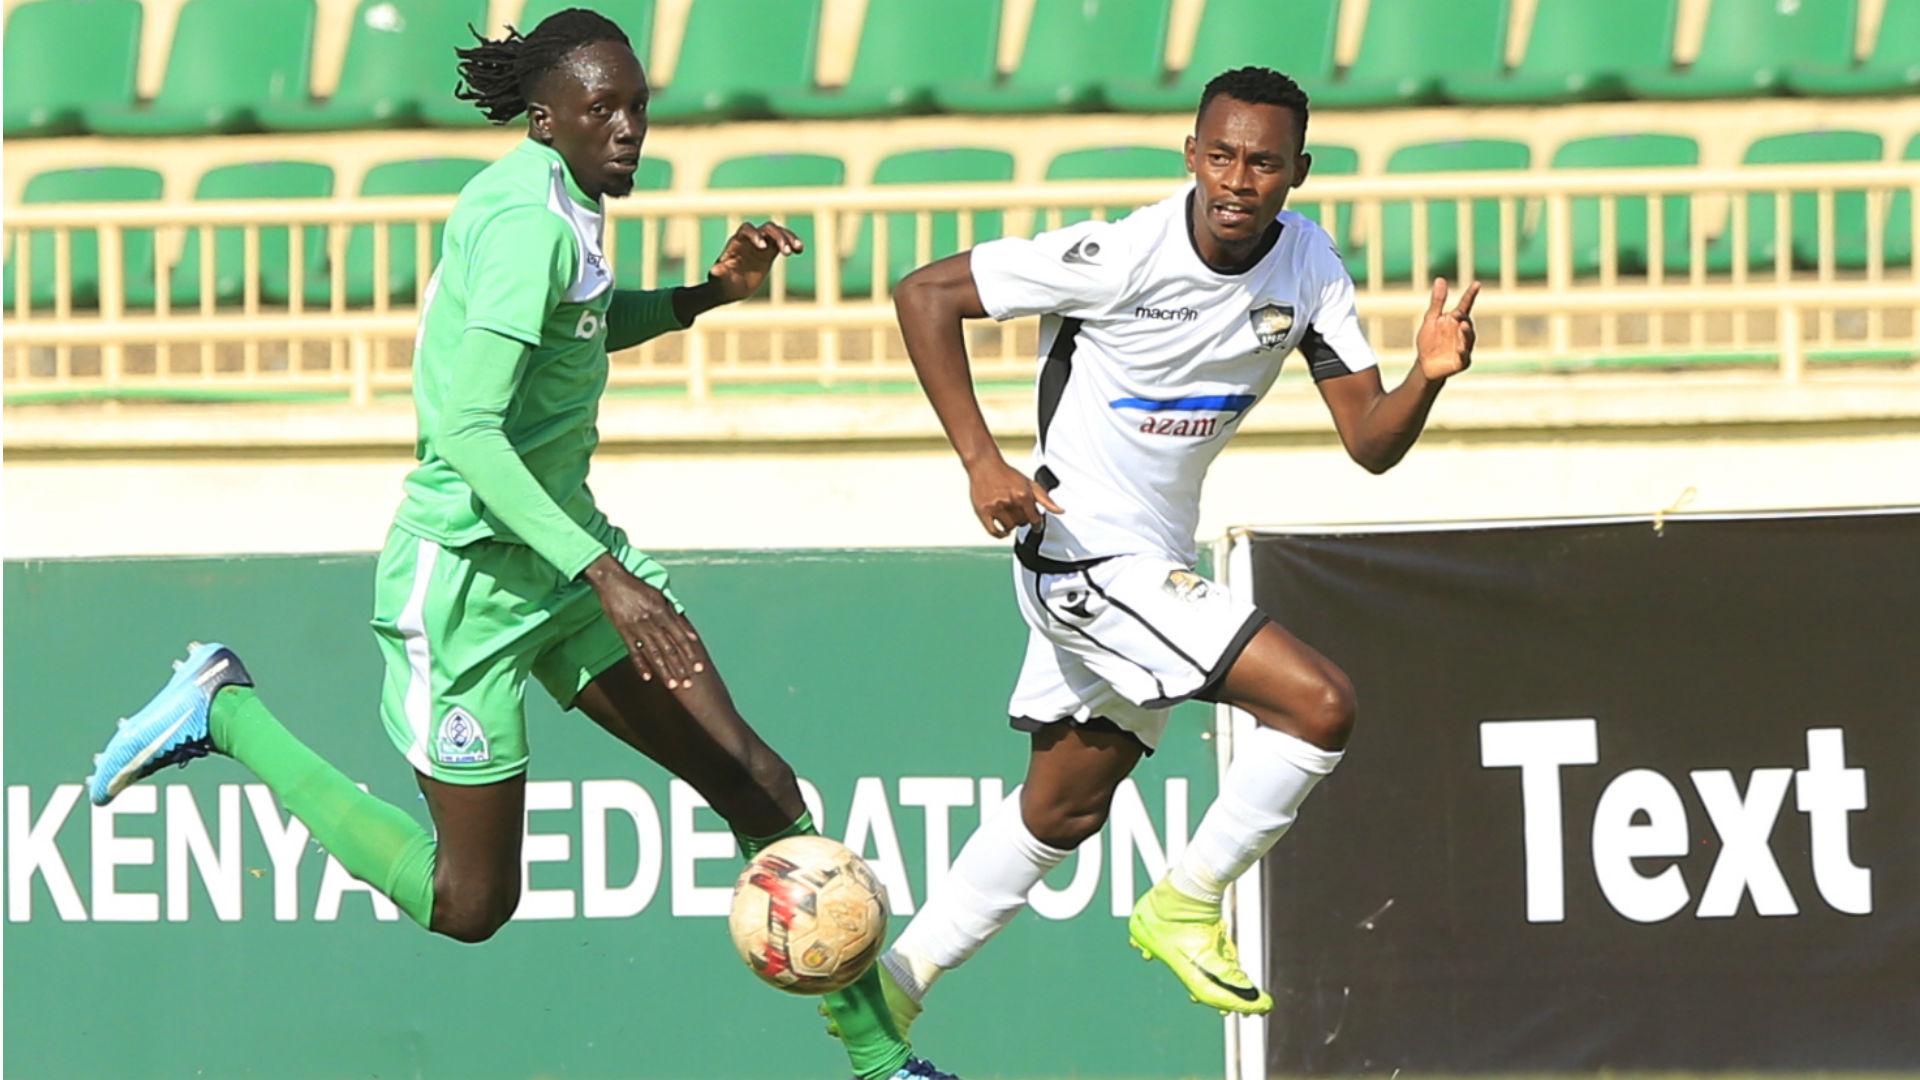 Caf Champions League: Gor Mahia tried to reach Algeria in vain – Aduda